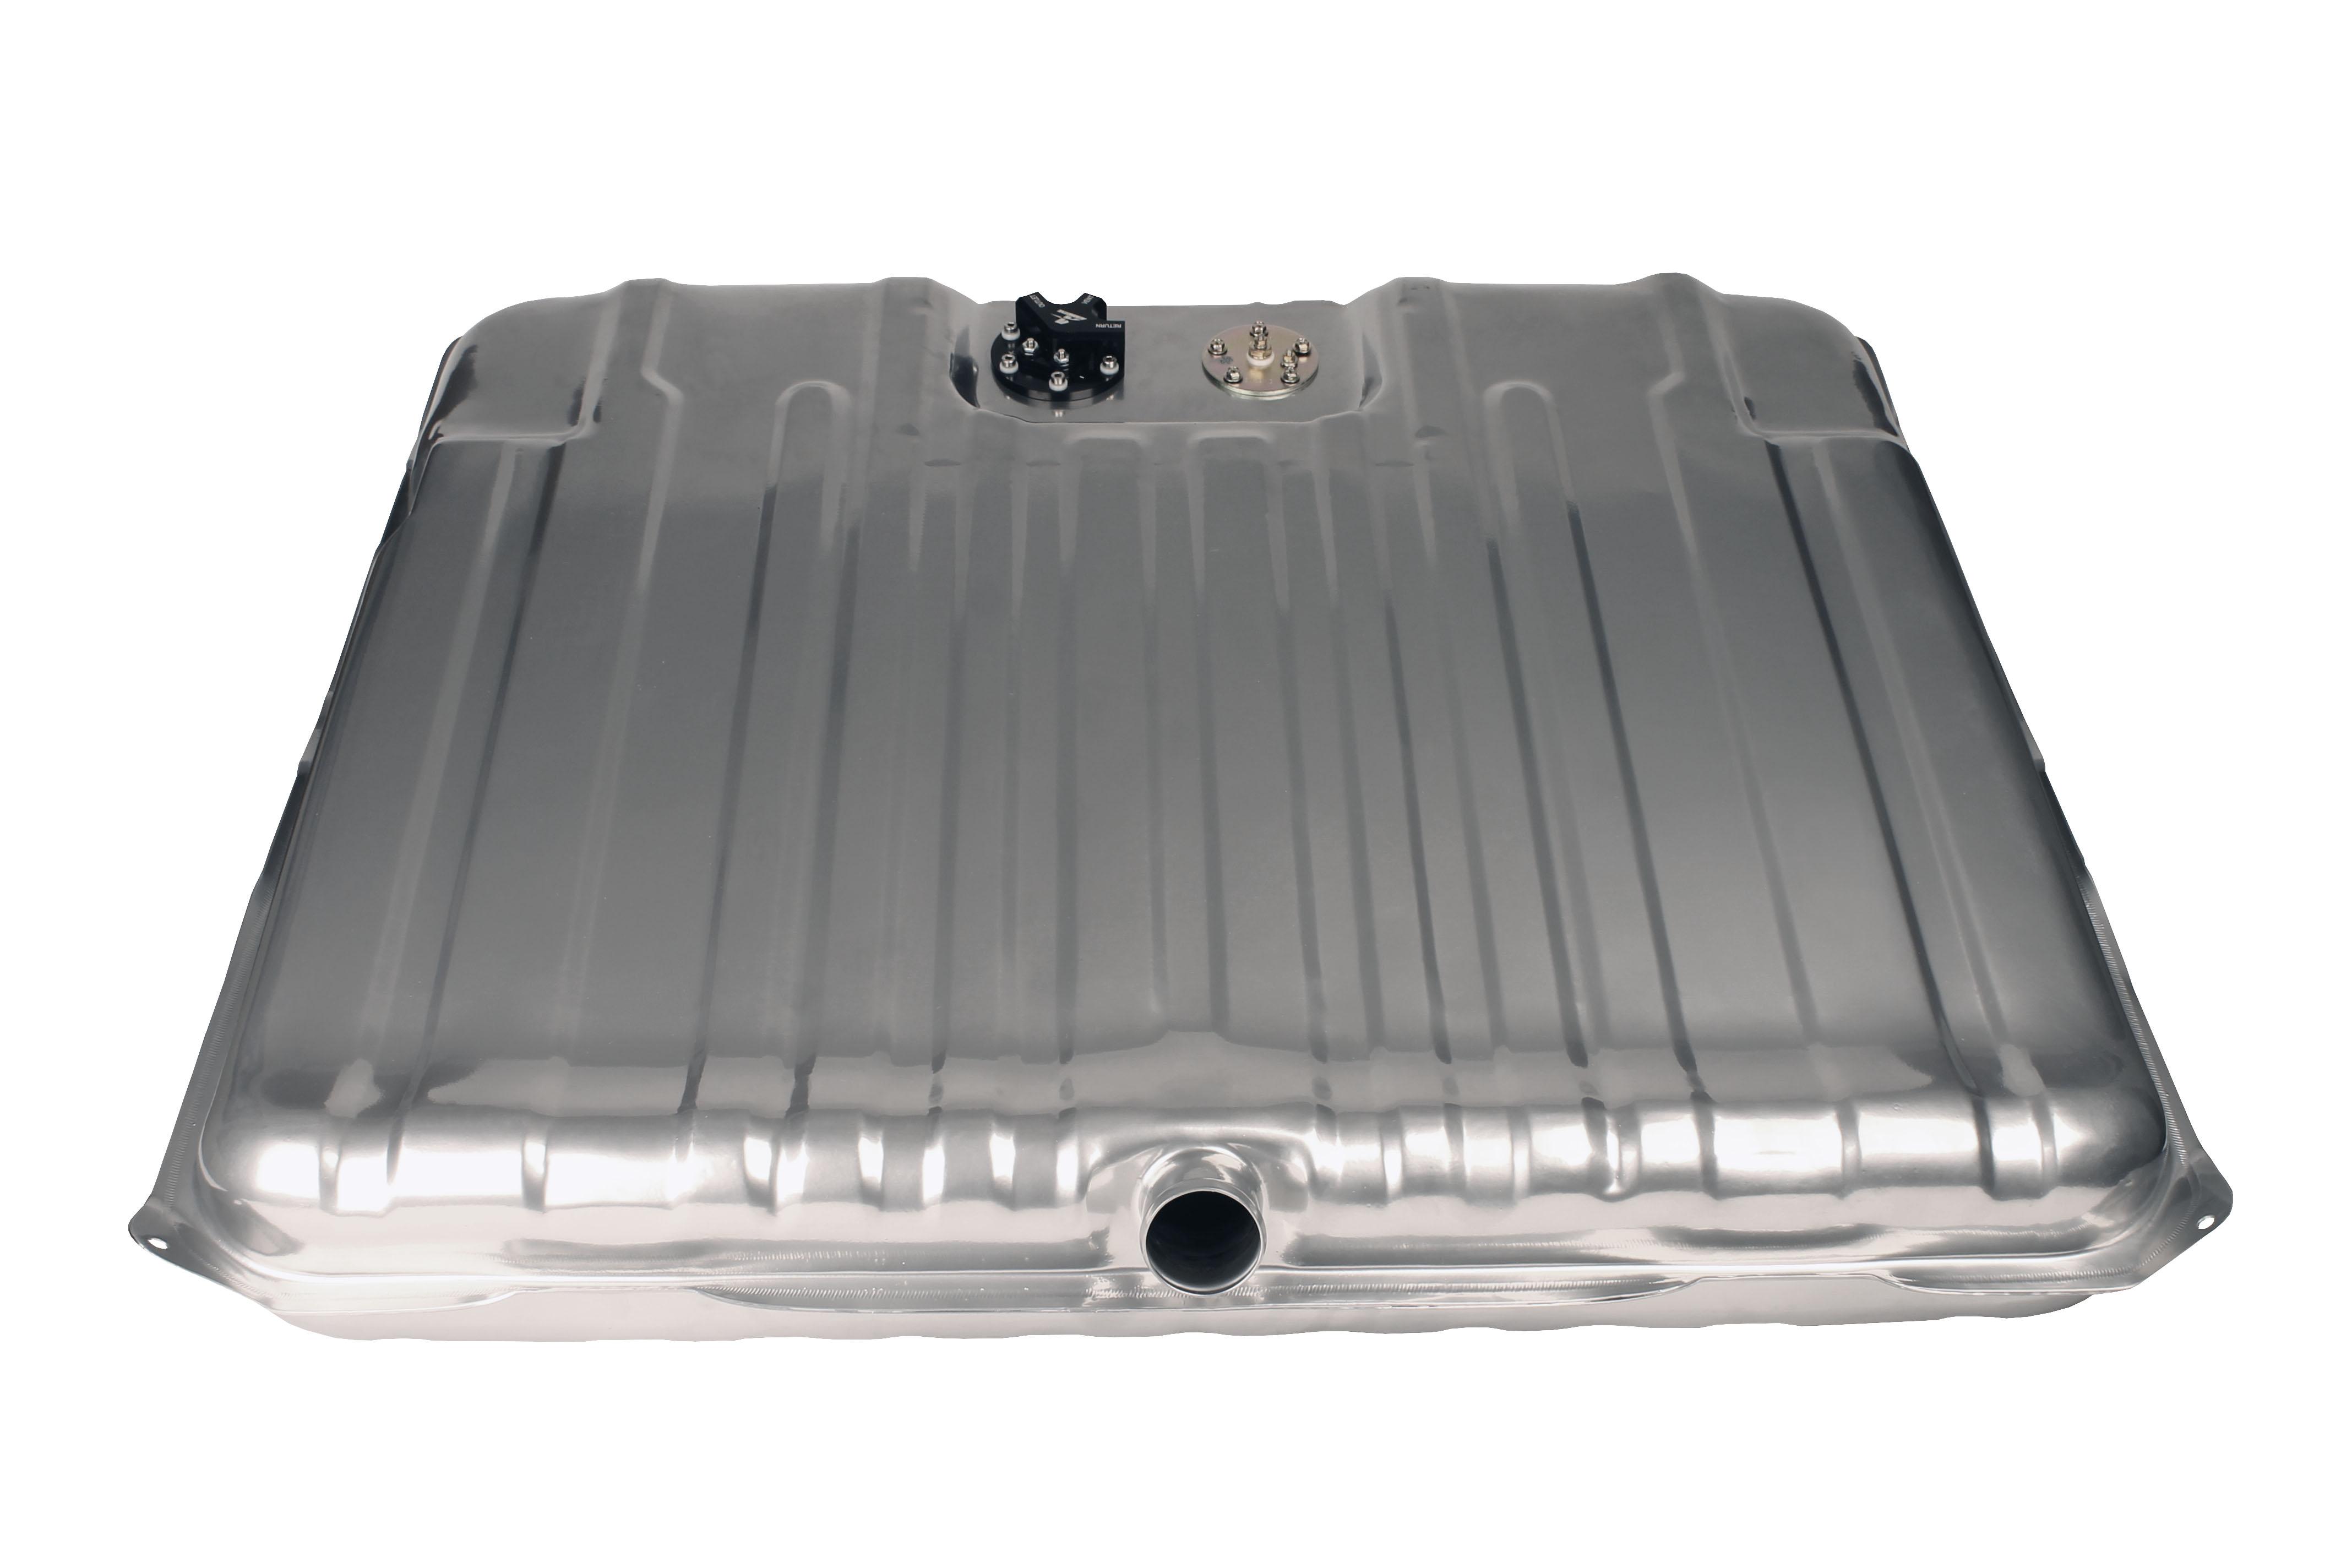 65-66 Impala Fuel Tank